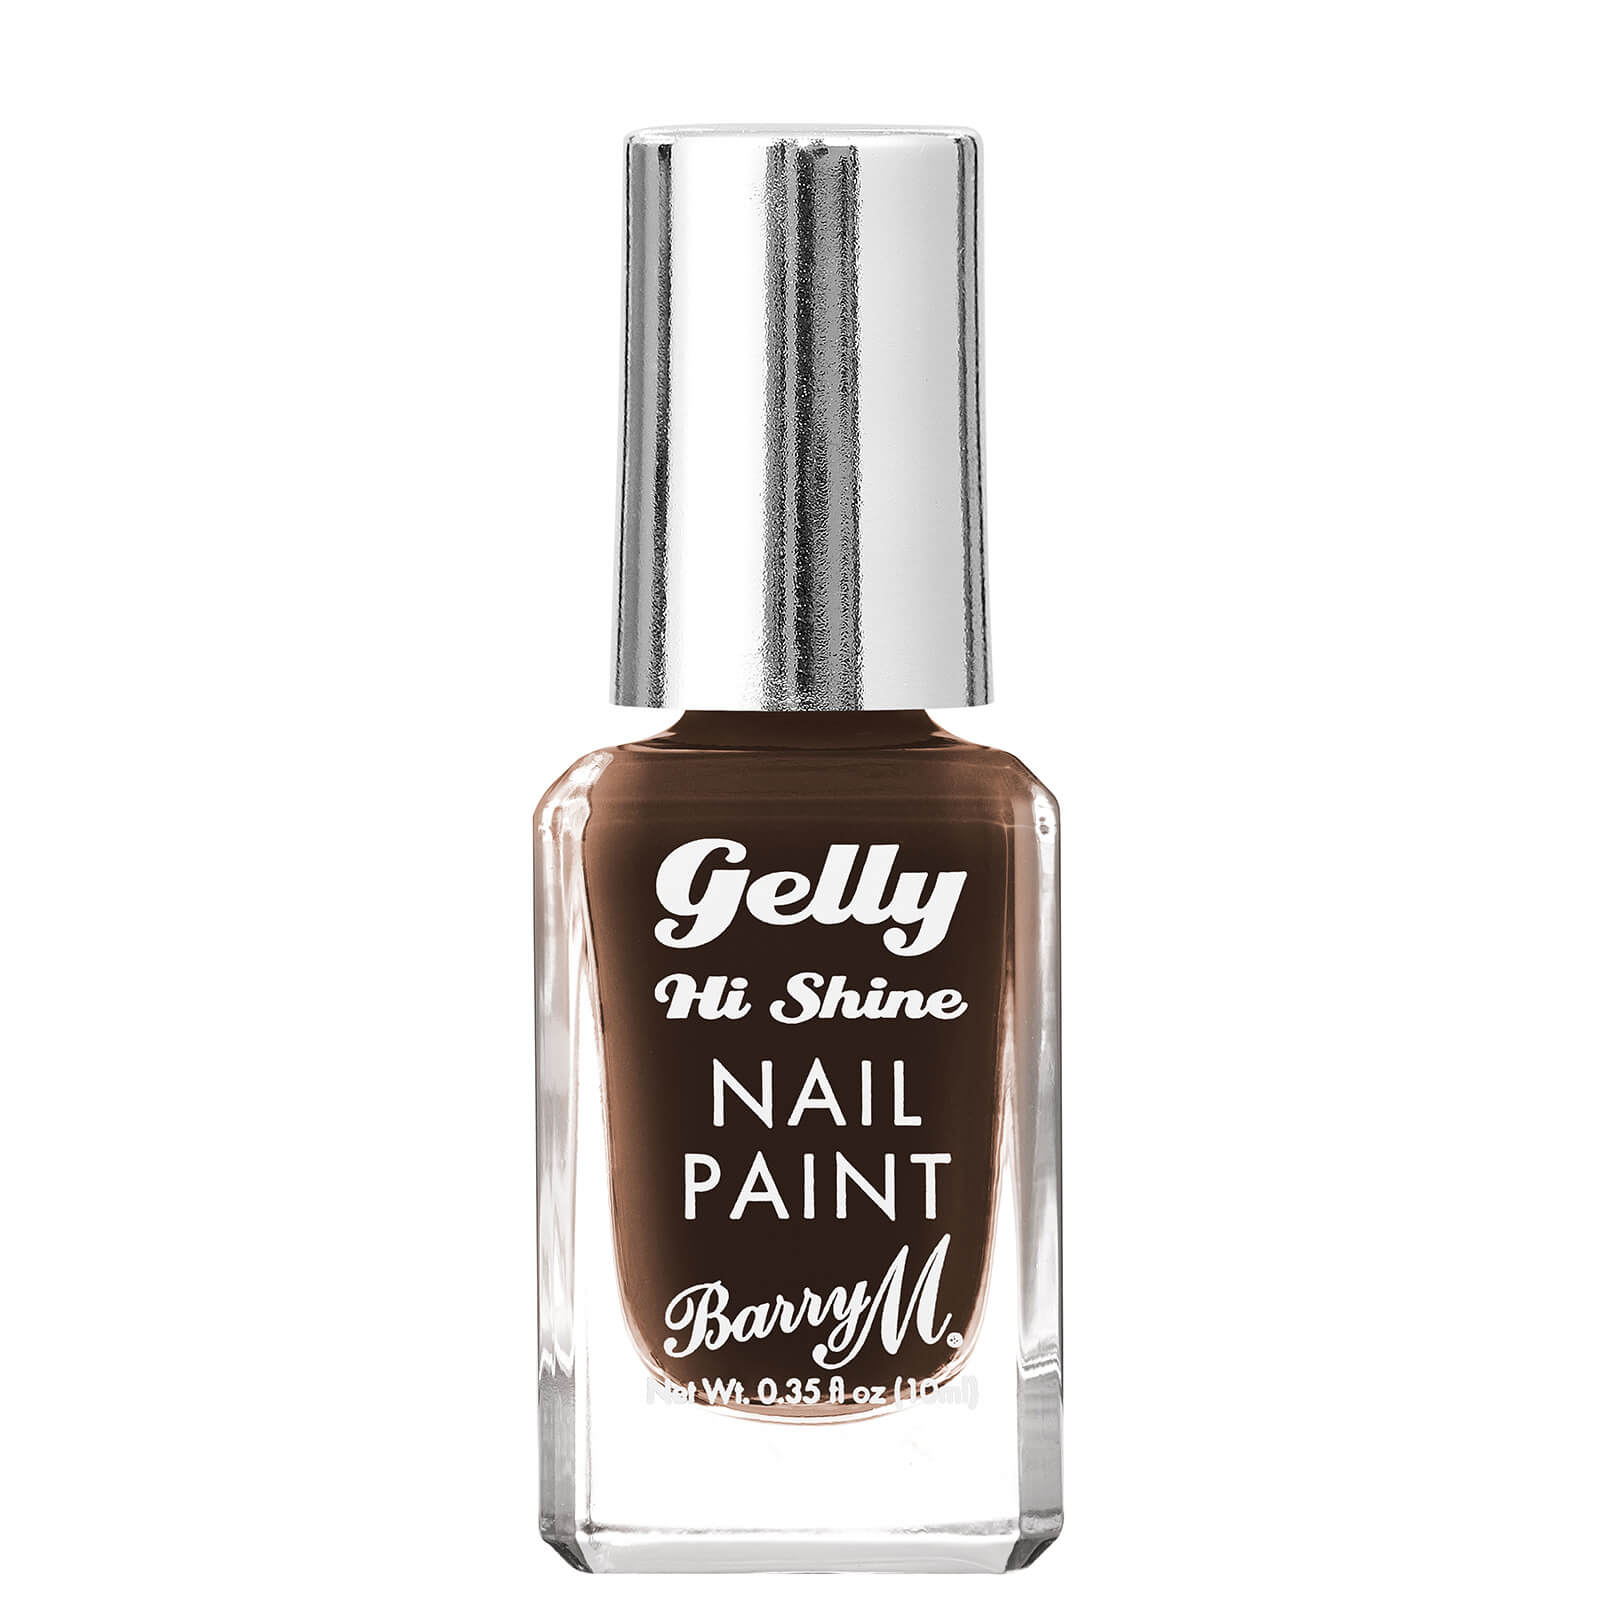 Купить Barry M Cosmetics Gelly Nail Paint 10ml (Various Shades) - Espresso